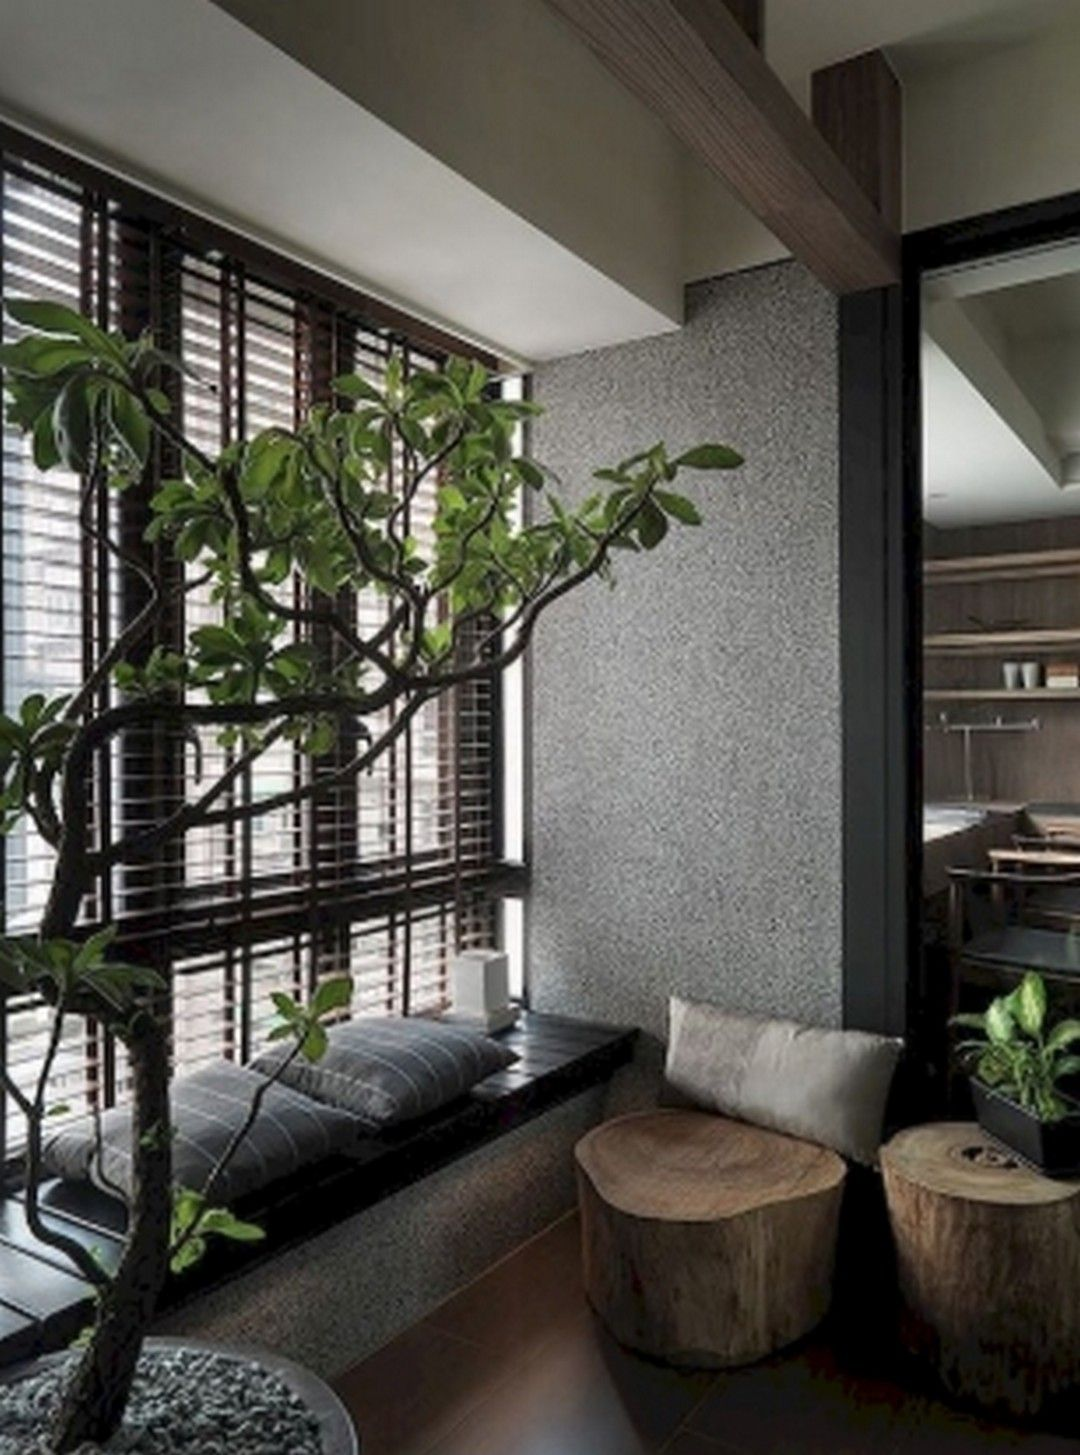 6 Japanese Zen Style Garden Design Ideas For Your Minimalist Home Apartment Living Room Japanese Interior Design Trendy Living Rooms Zen decor living room